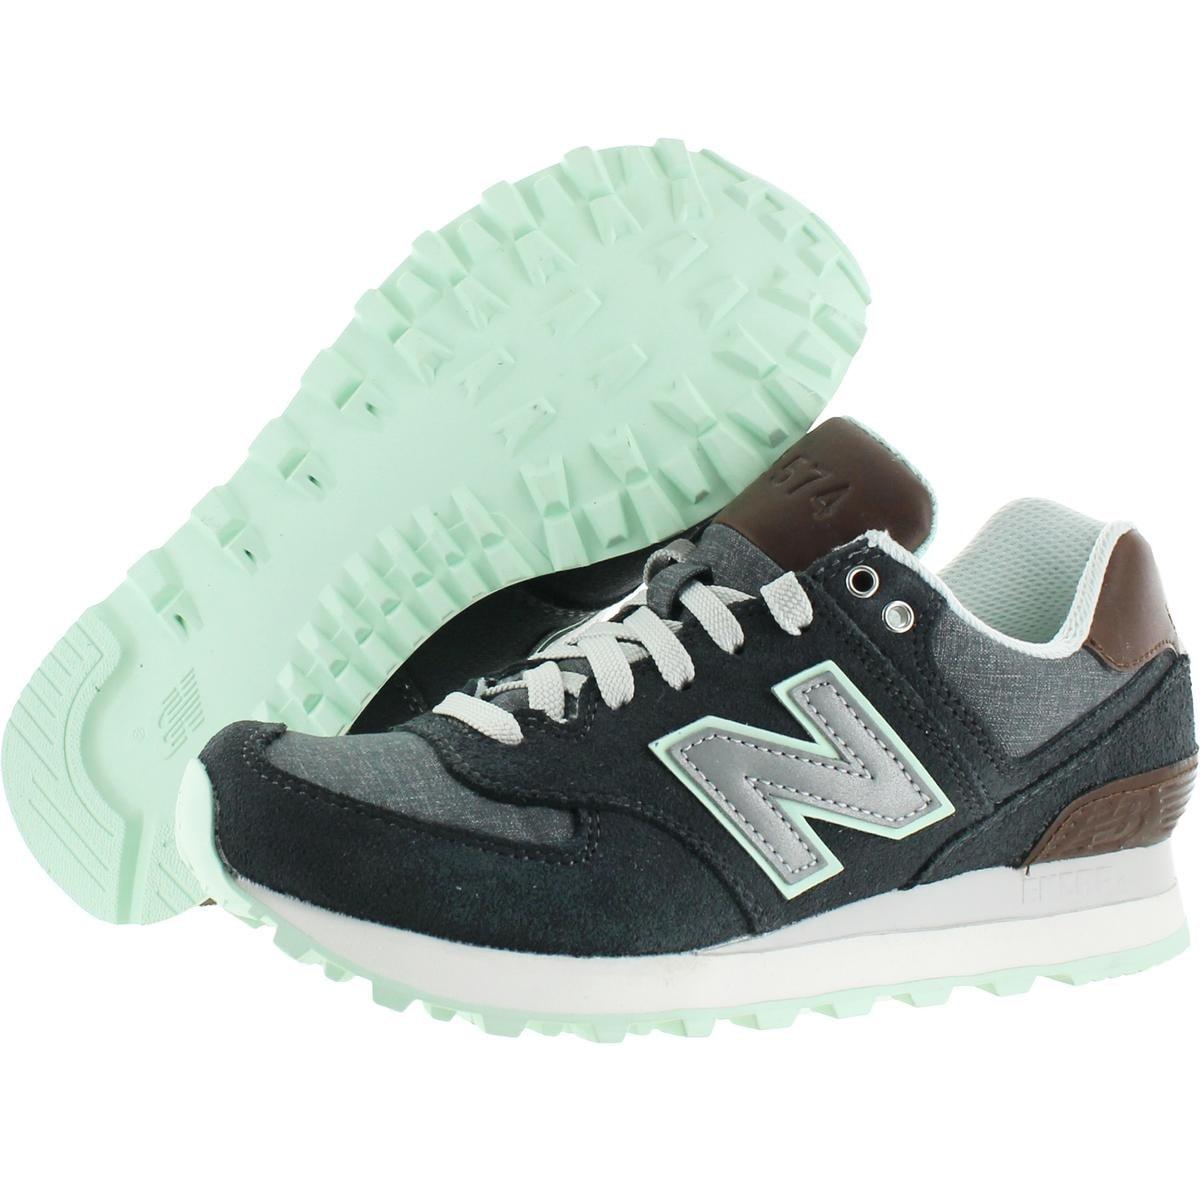 Shop New Balance Womens NB 574 Walking